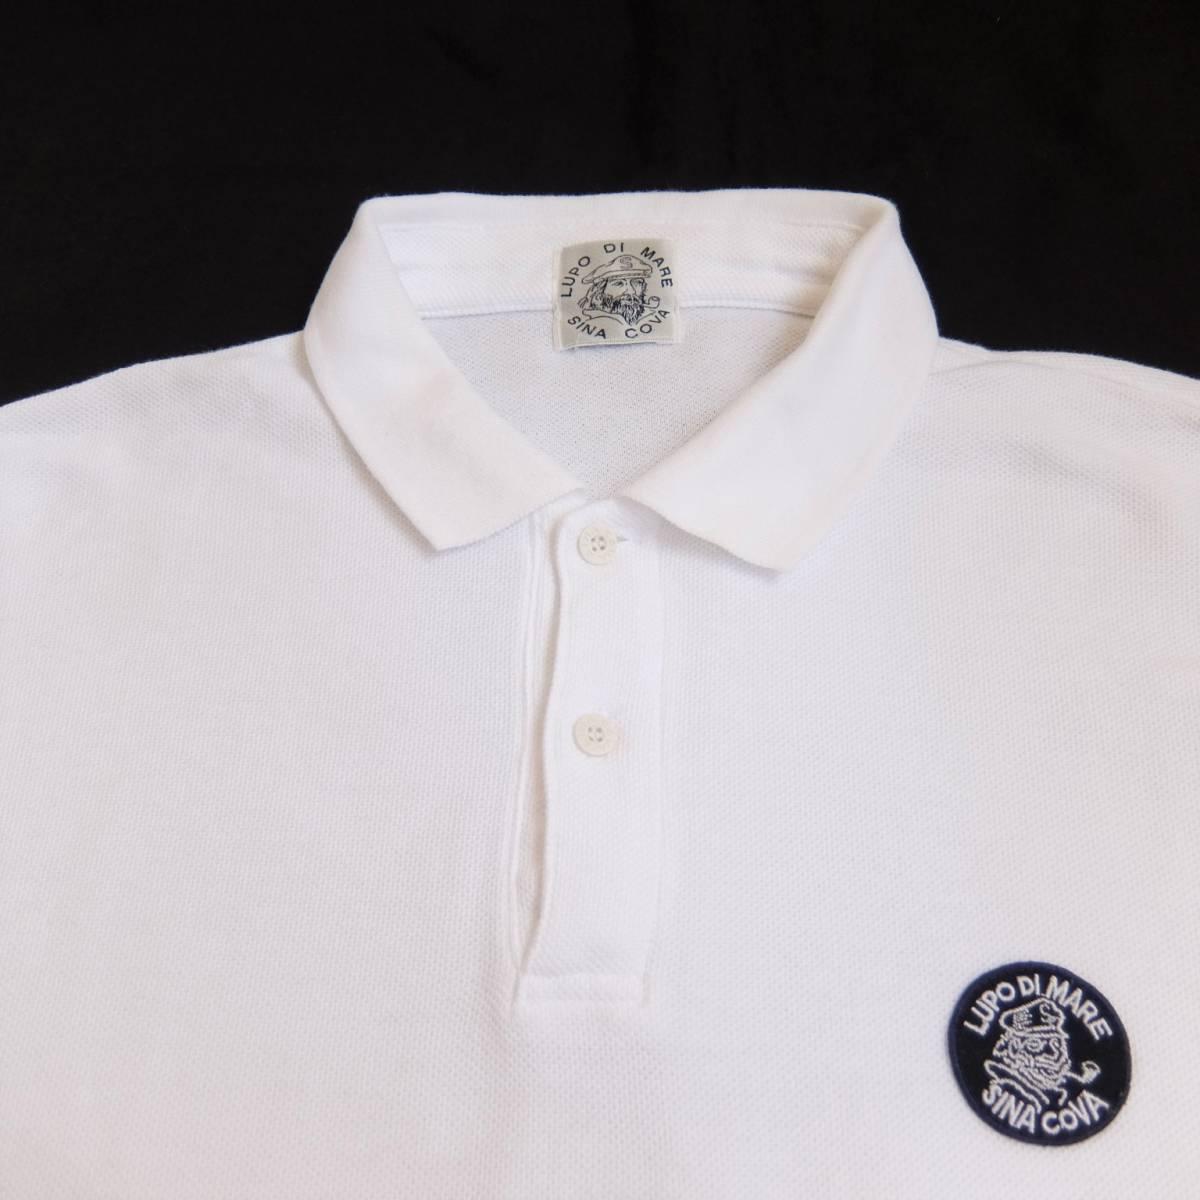 SINA COVA シナコバ ワッペン付き 長袖 ポロシャツ ホワイト Lサイズ_画像5